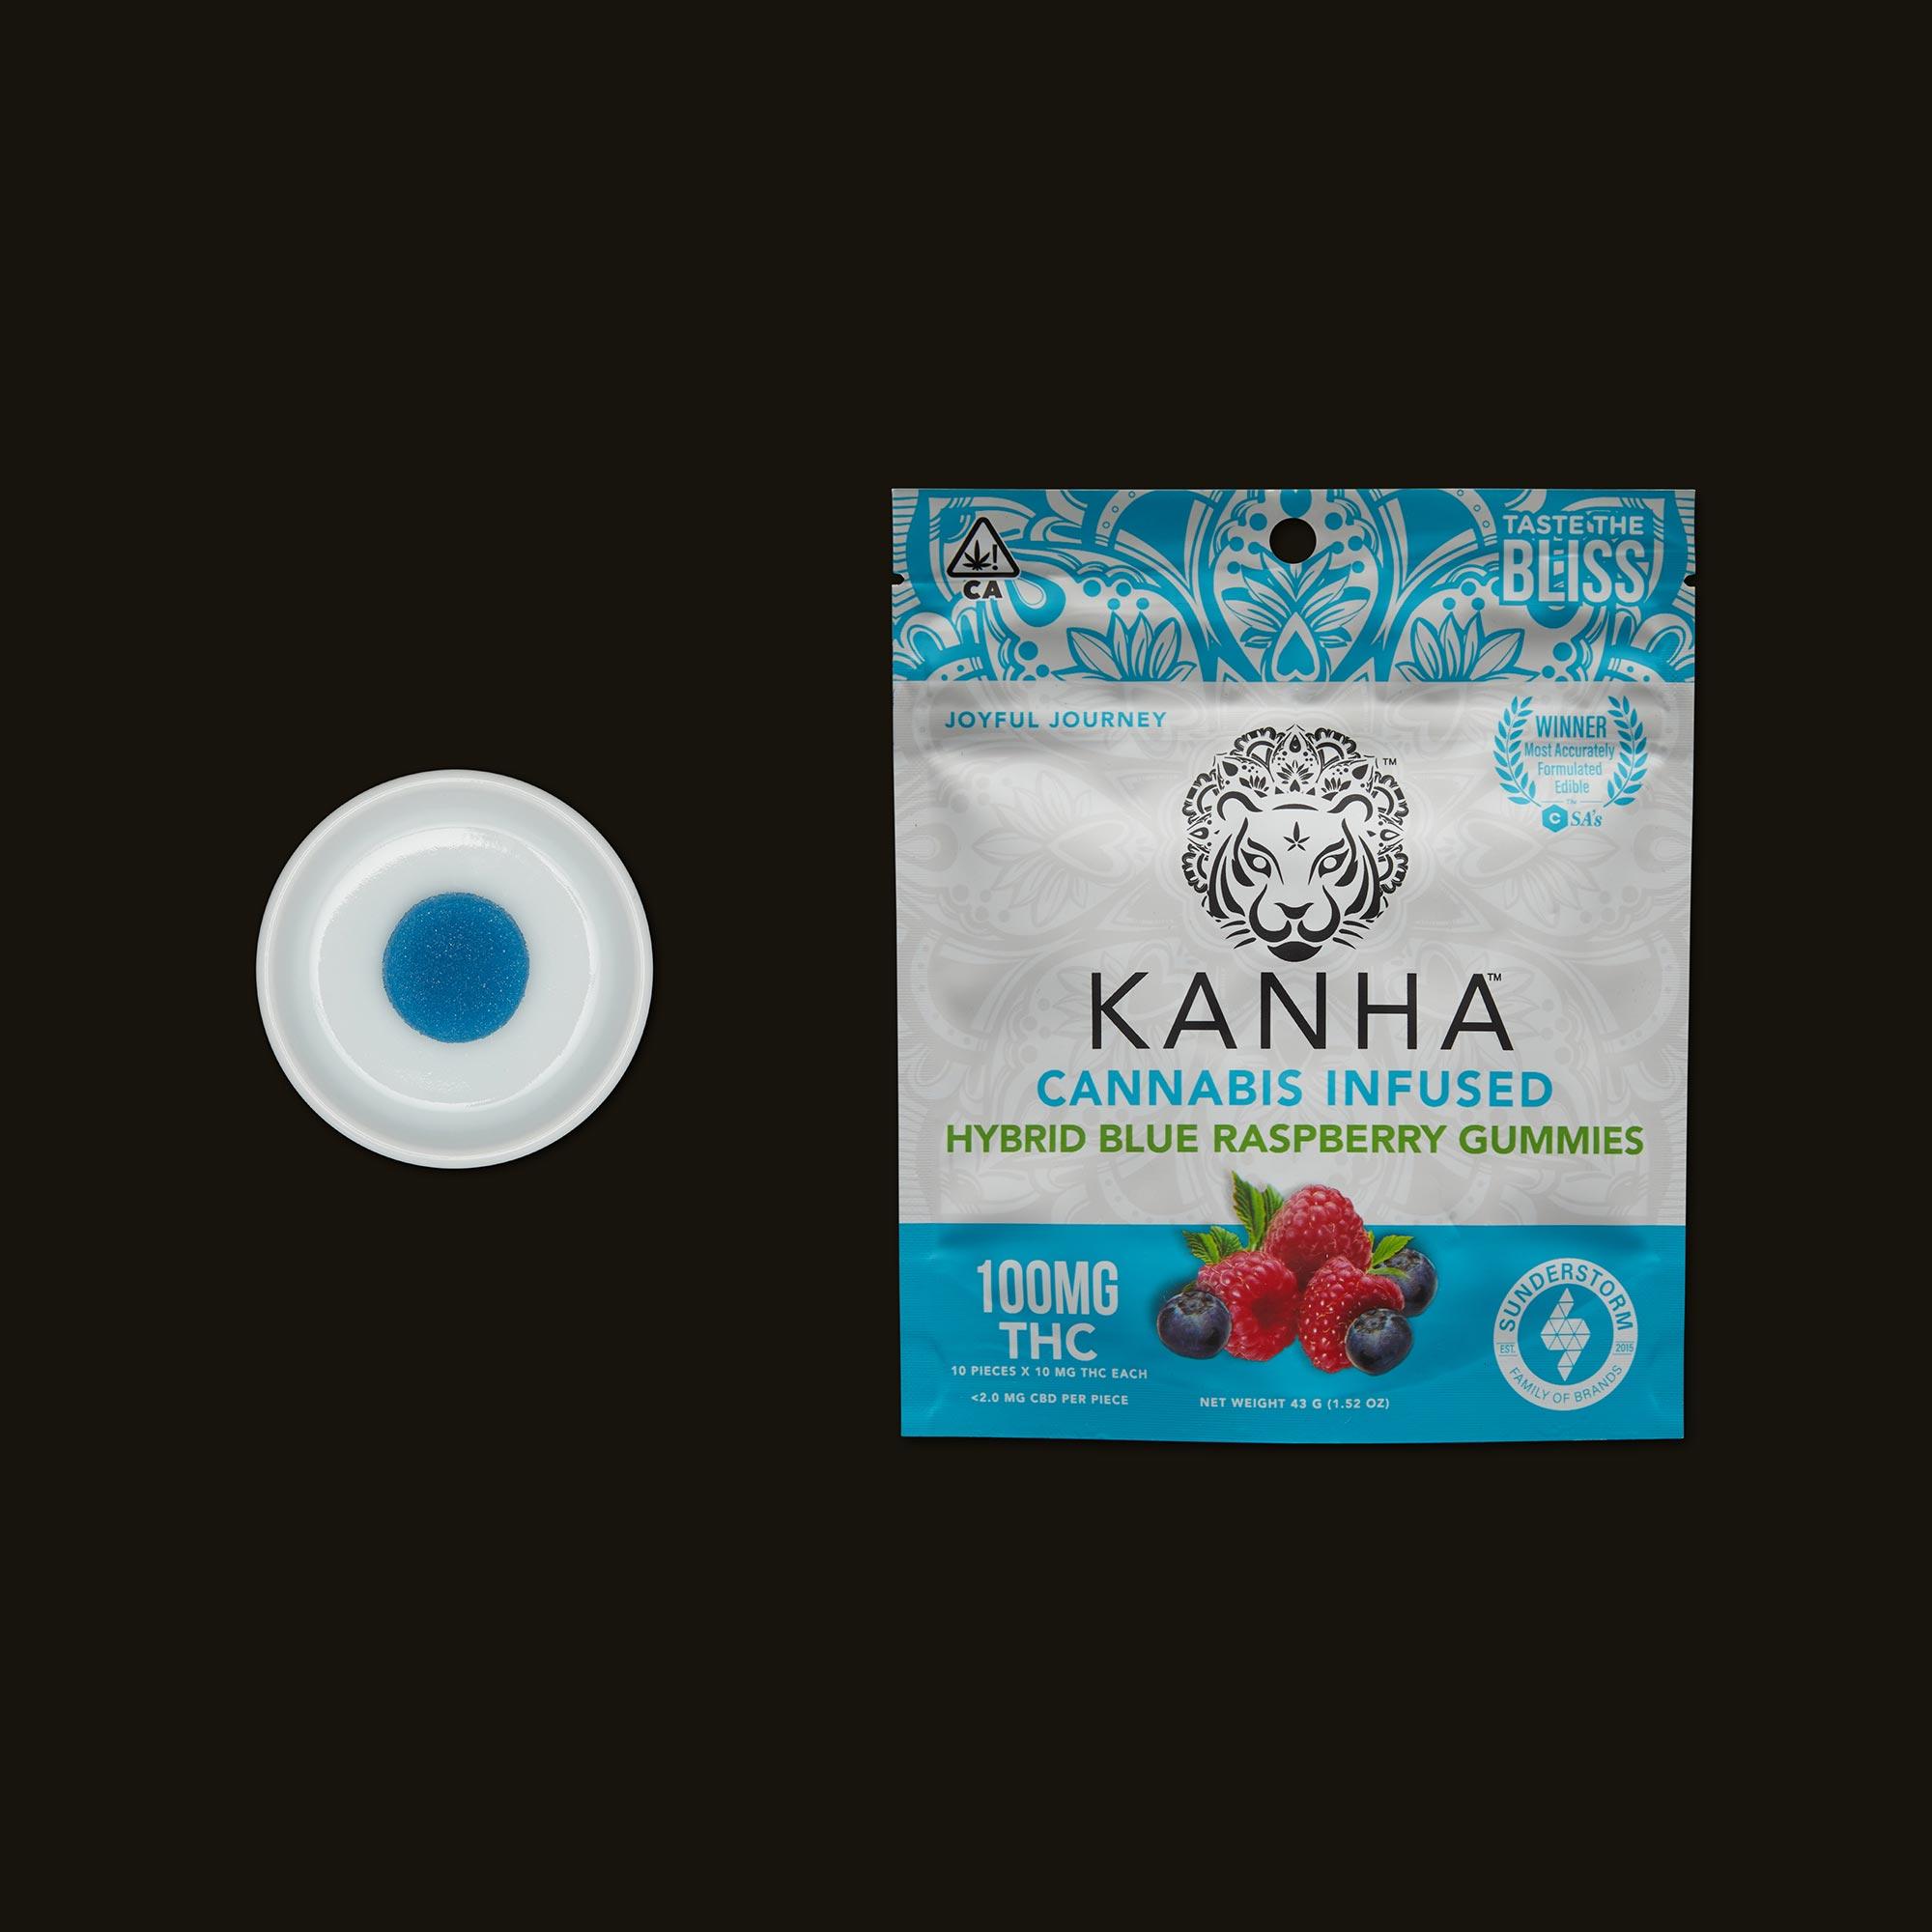 Kanha Hybrid Blue Raspberry Gummies